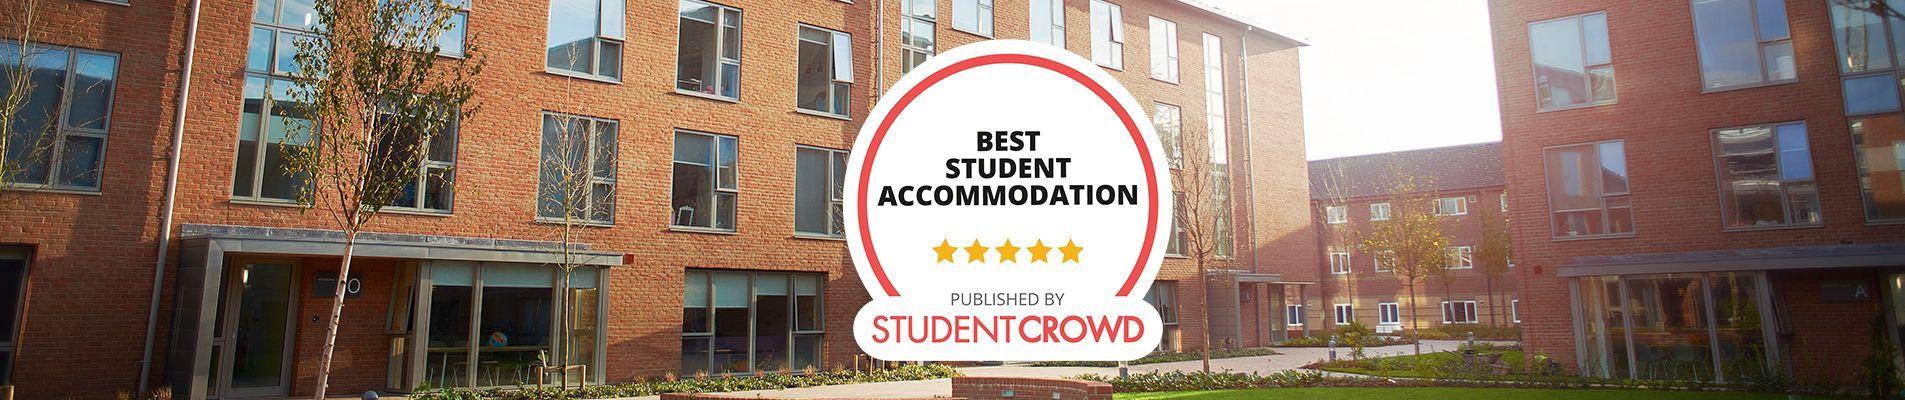 StudentCrowd-Best-Student-Accomm-2019-Header